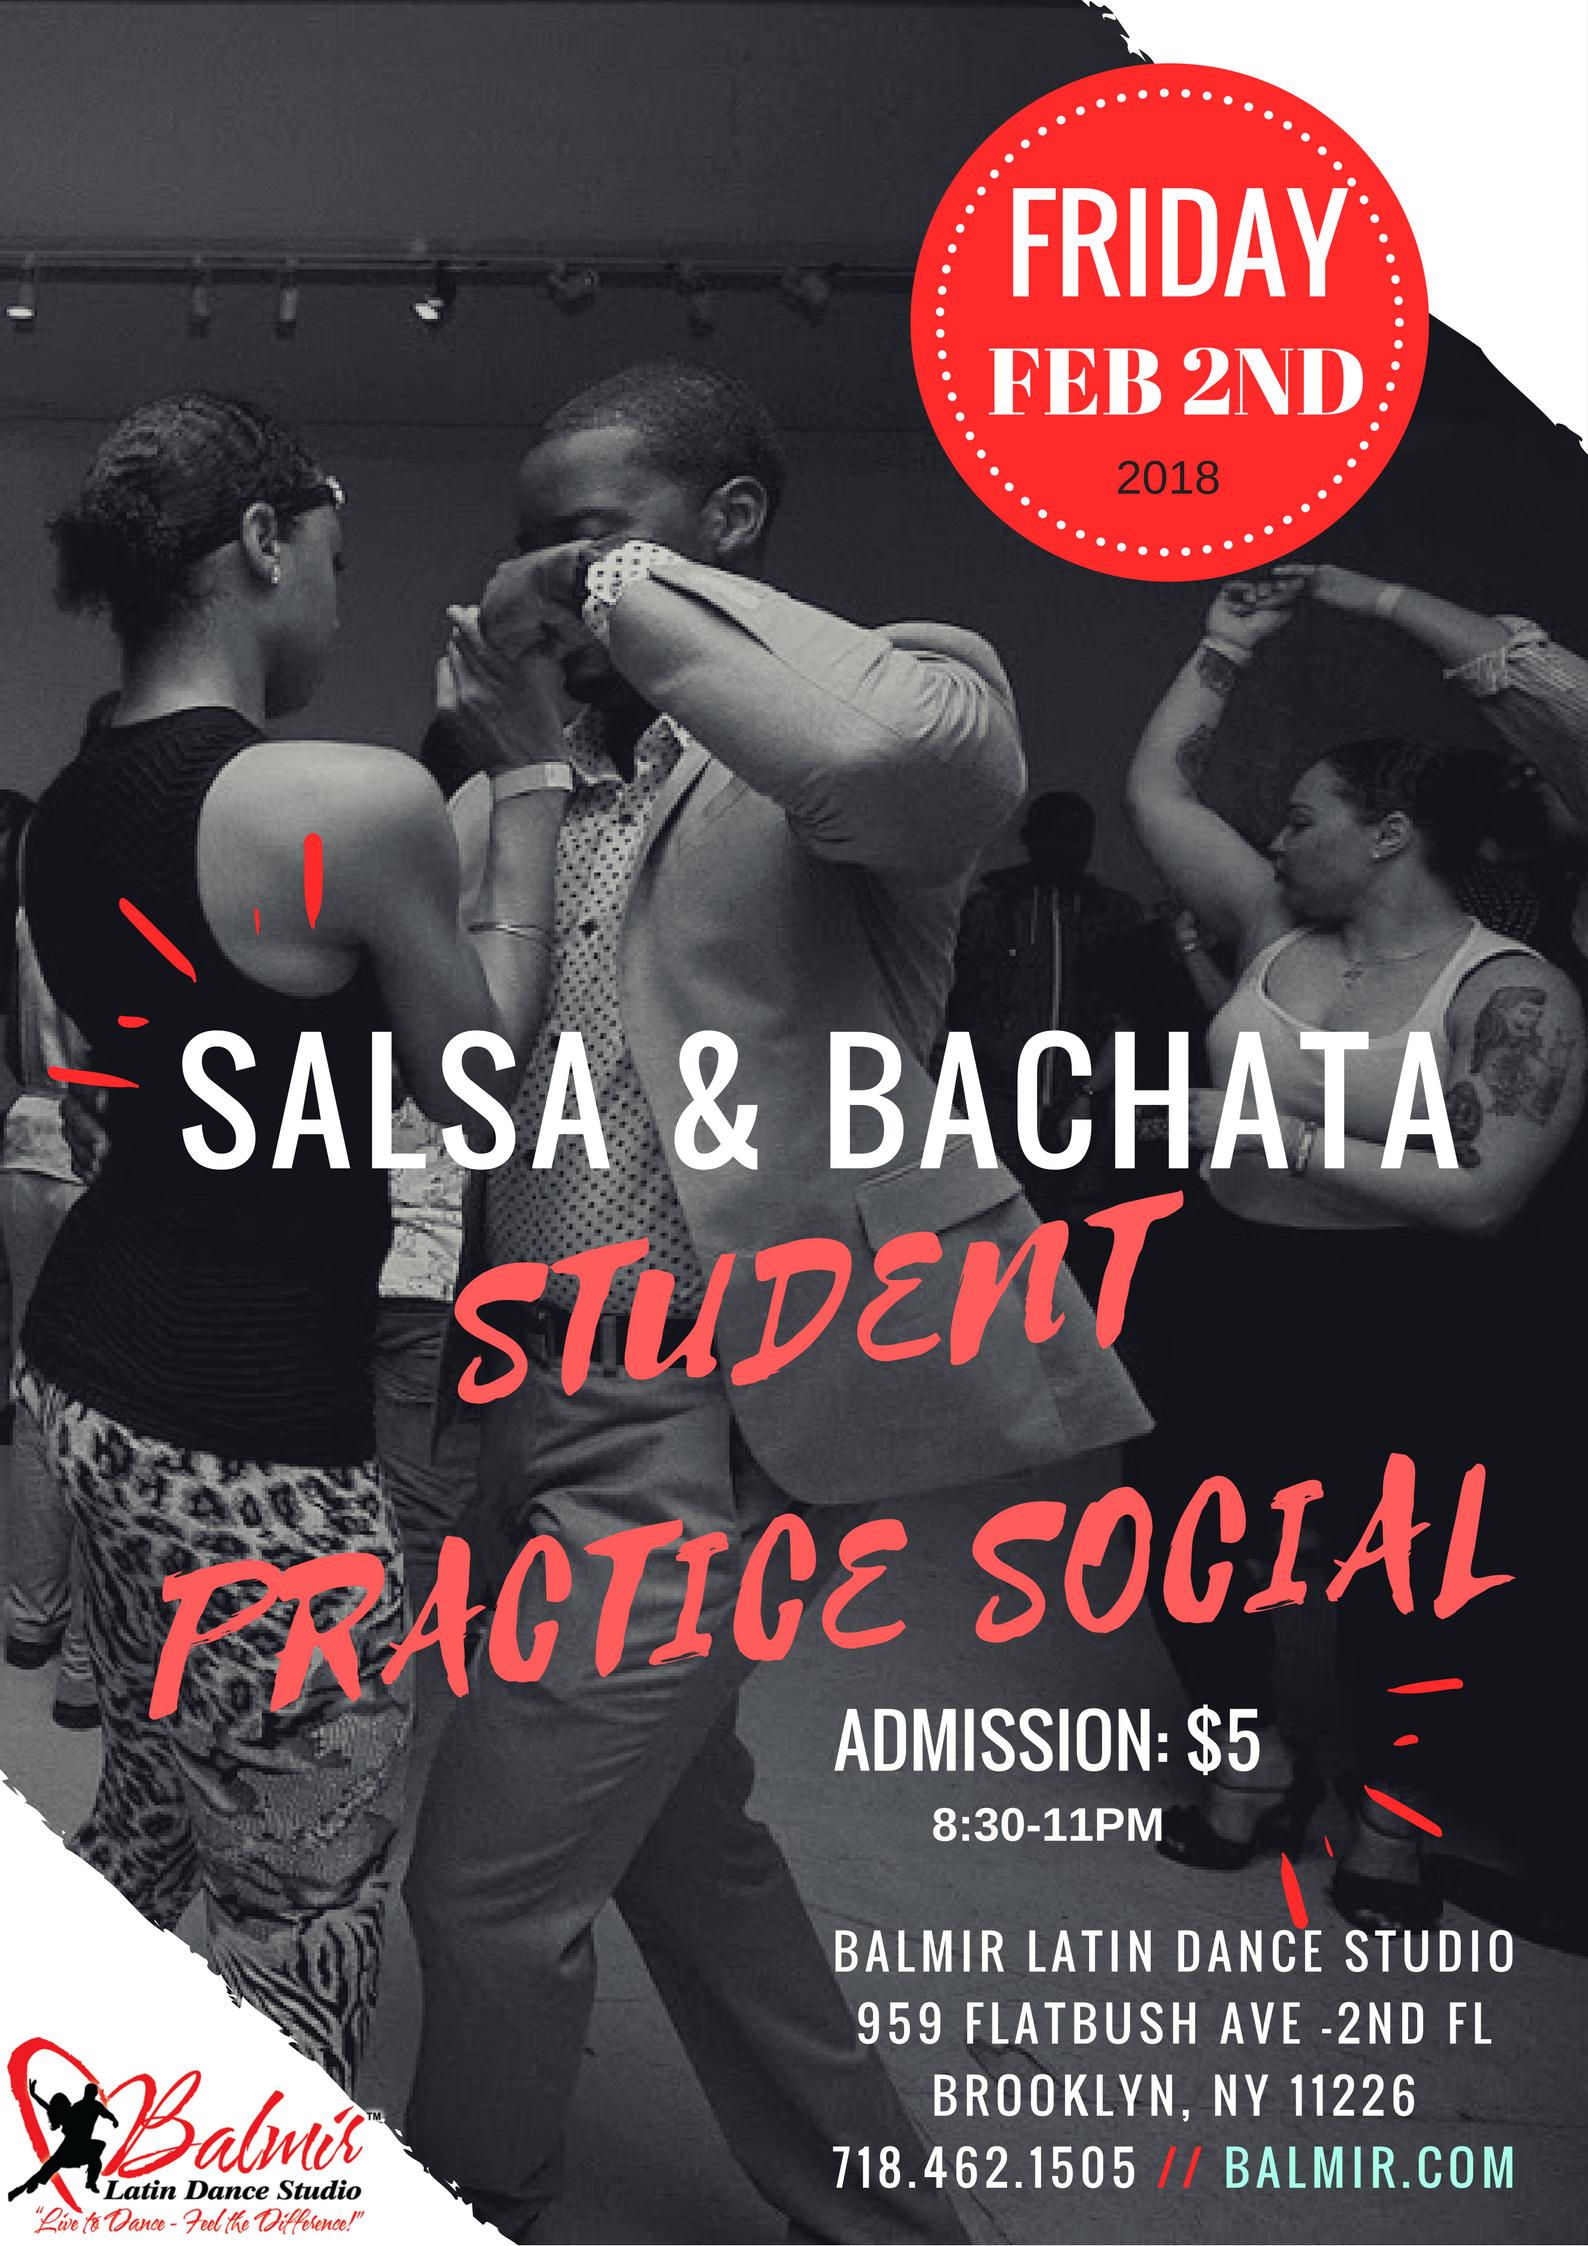 FEB 2ND BALMIR LATIN DANCE STUDIO SALSA BACHATA PRACTICE.png